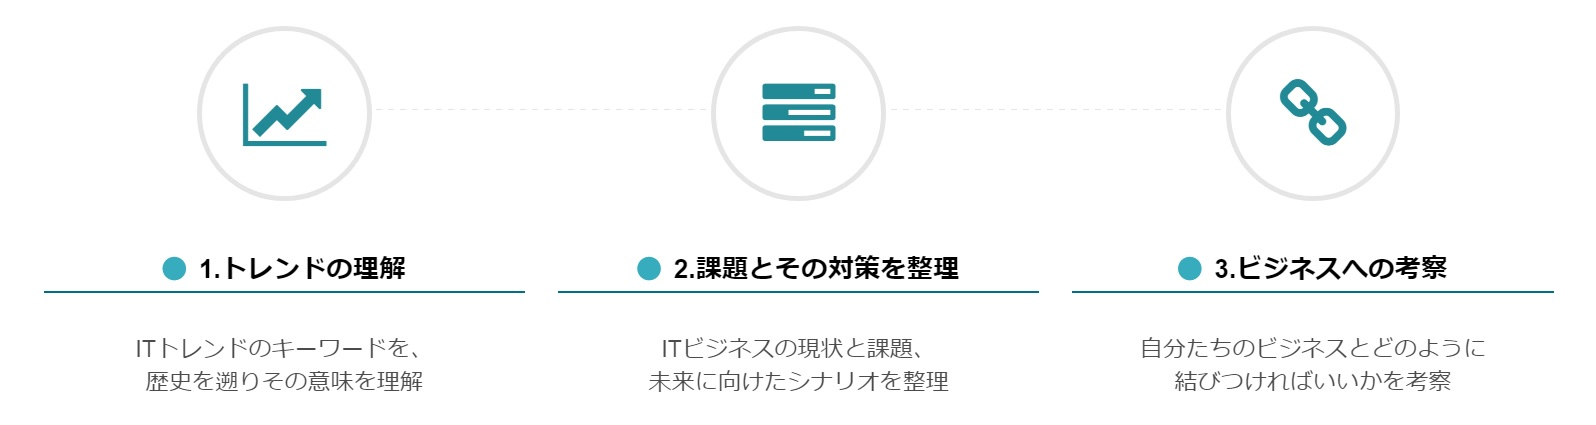 ITソリューション塾 学習のプロセス